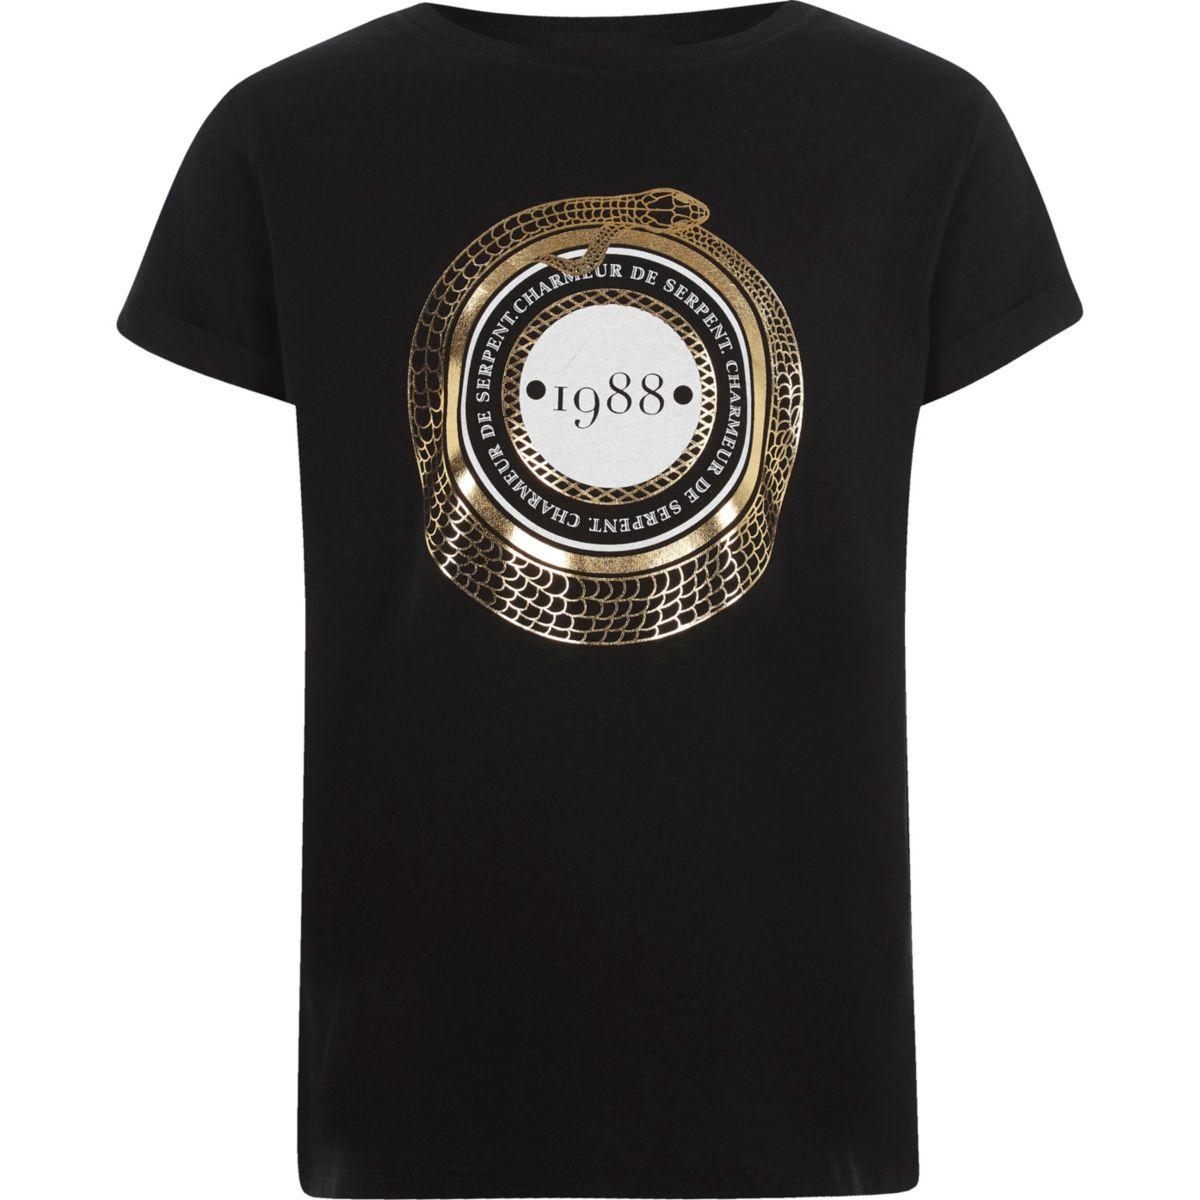 Girls black '1988' short sleeve T-shirt